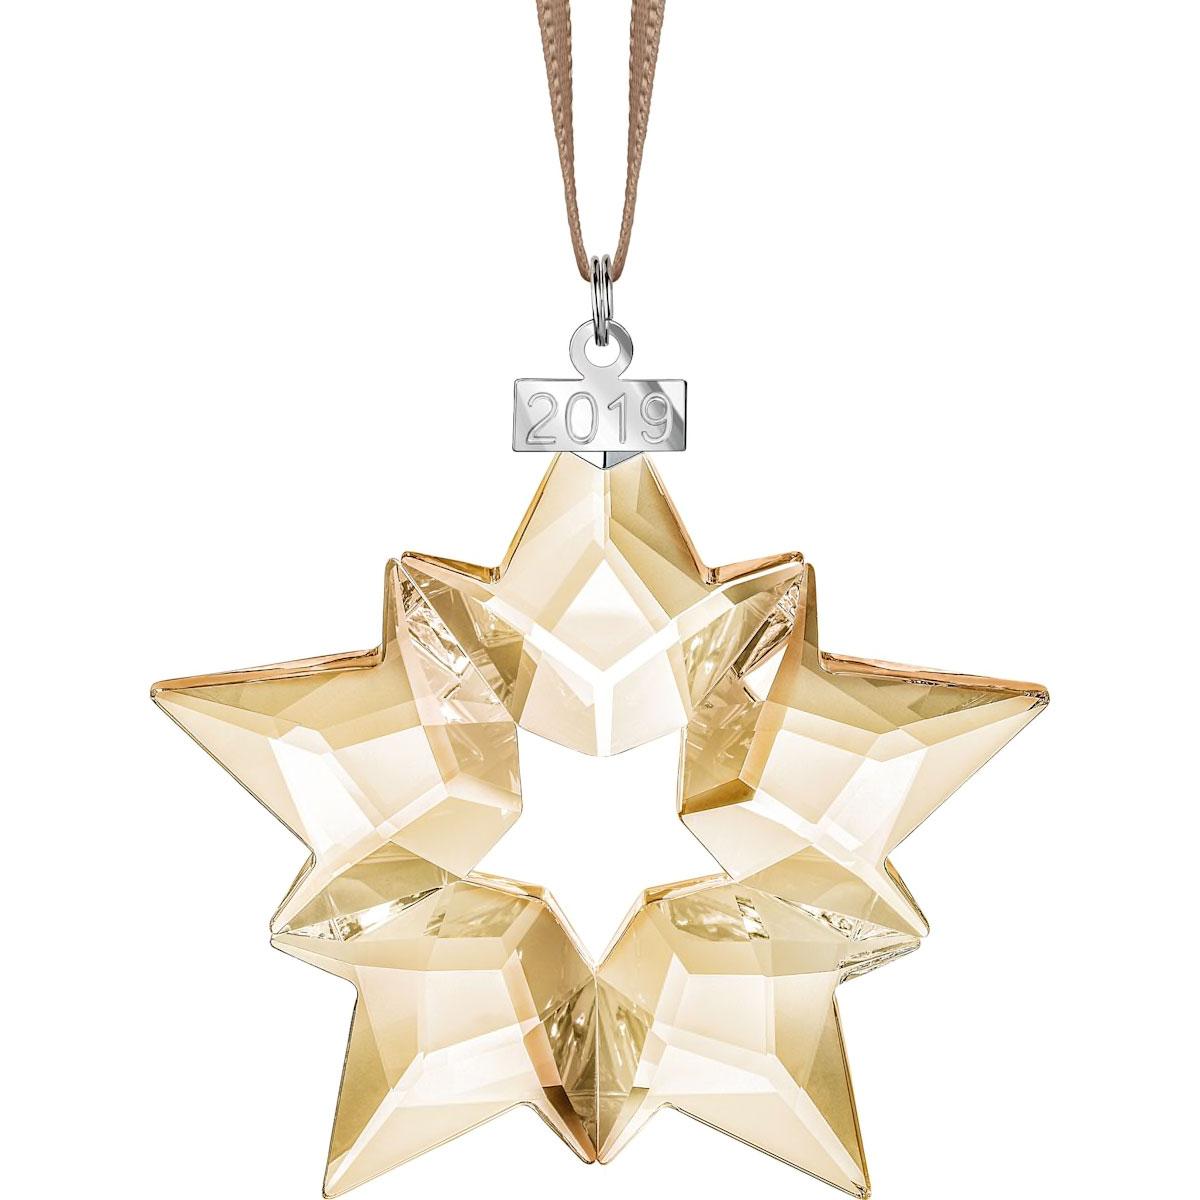 Swarovski SCS Christmas Ornament, Annual Edition 2019